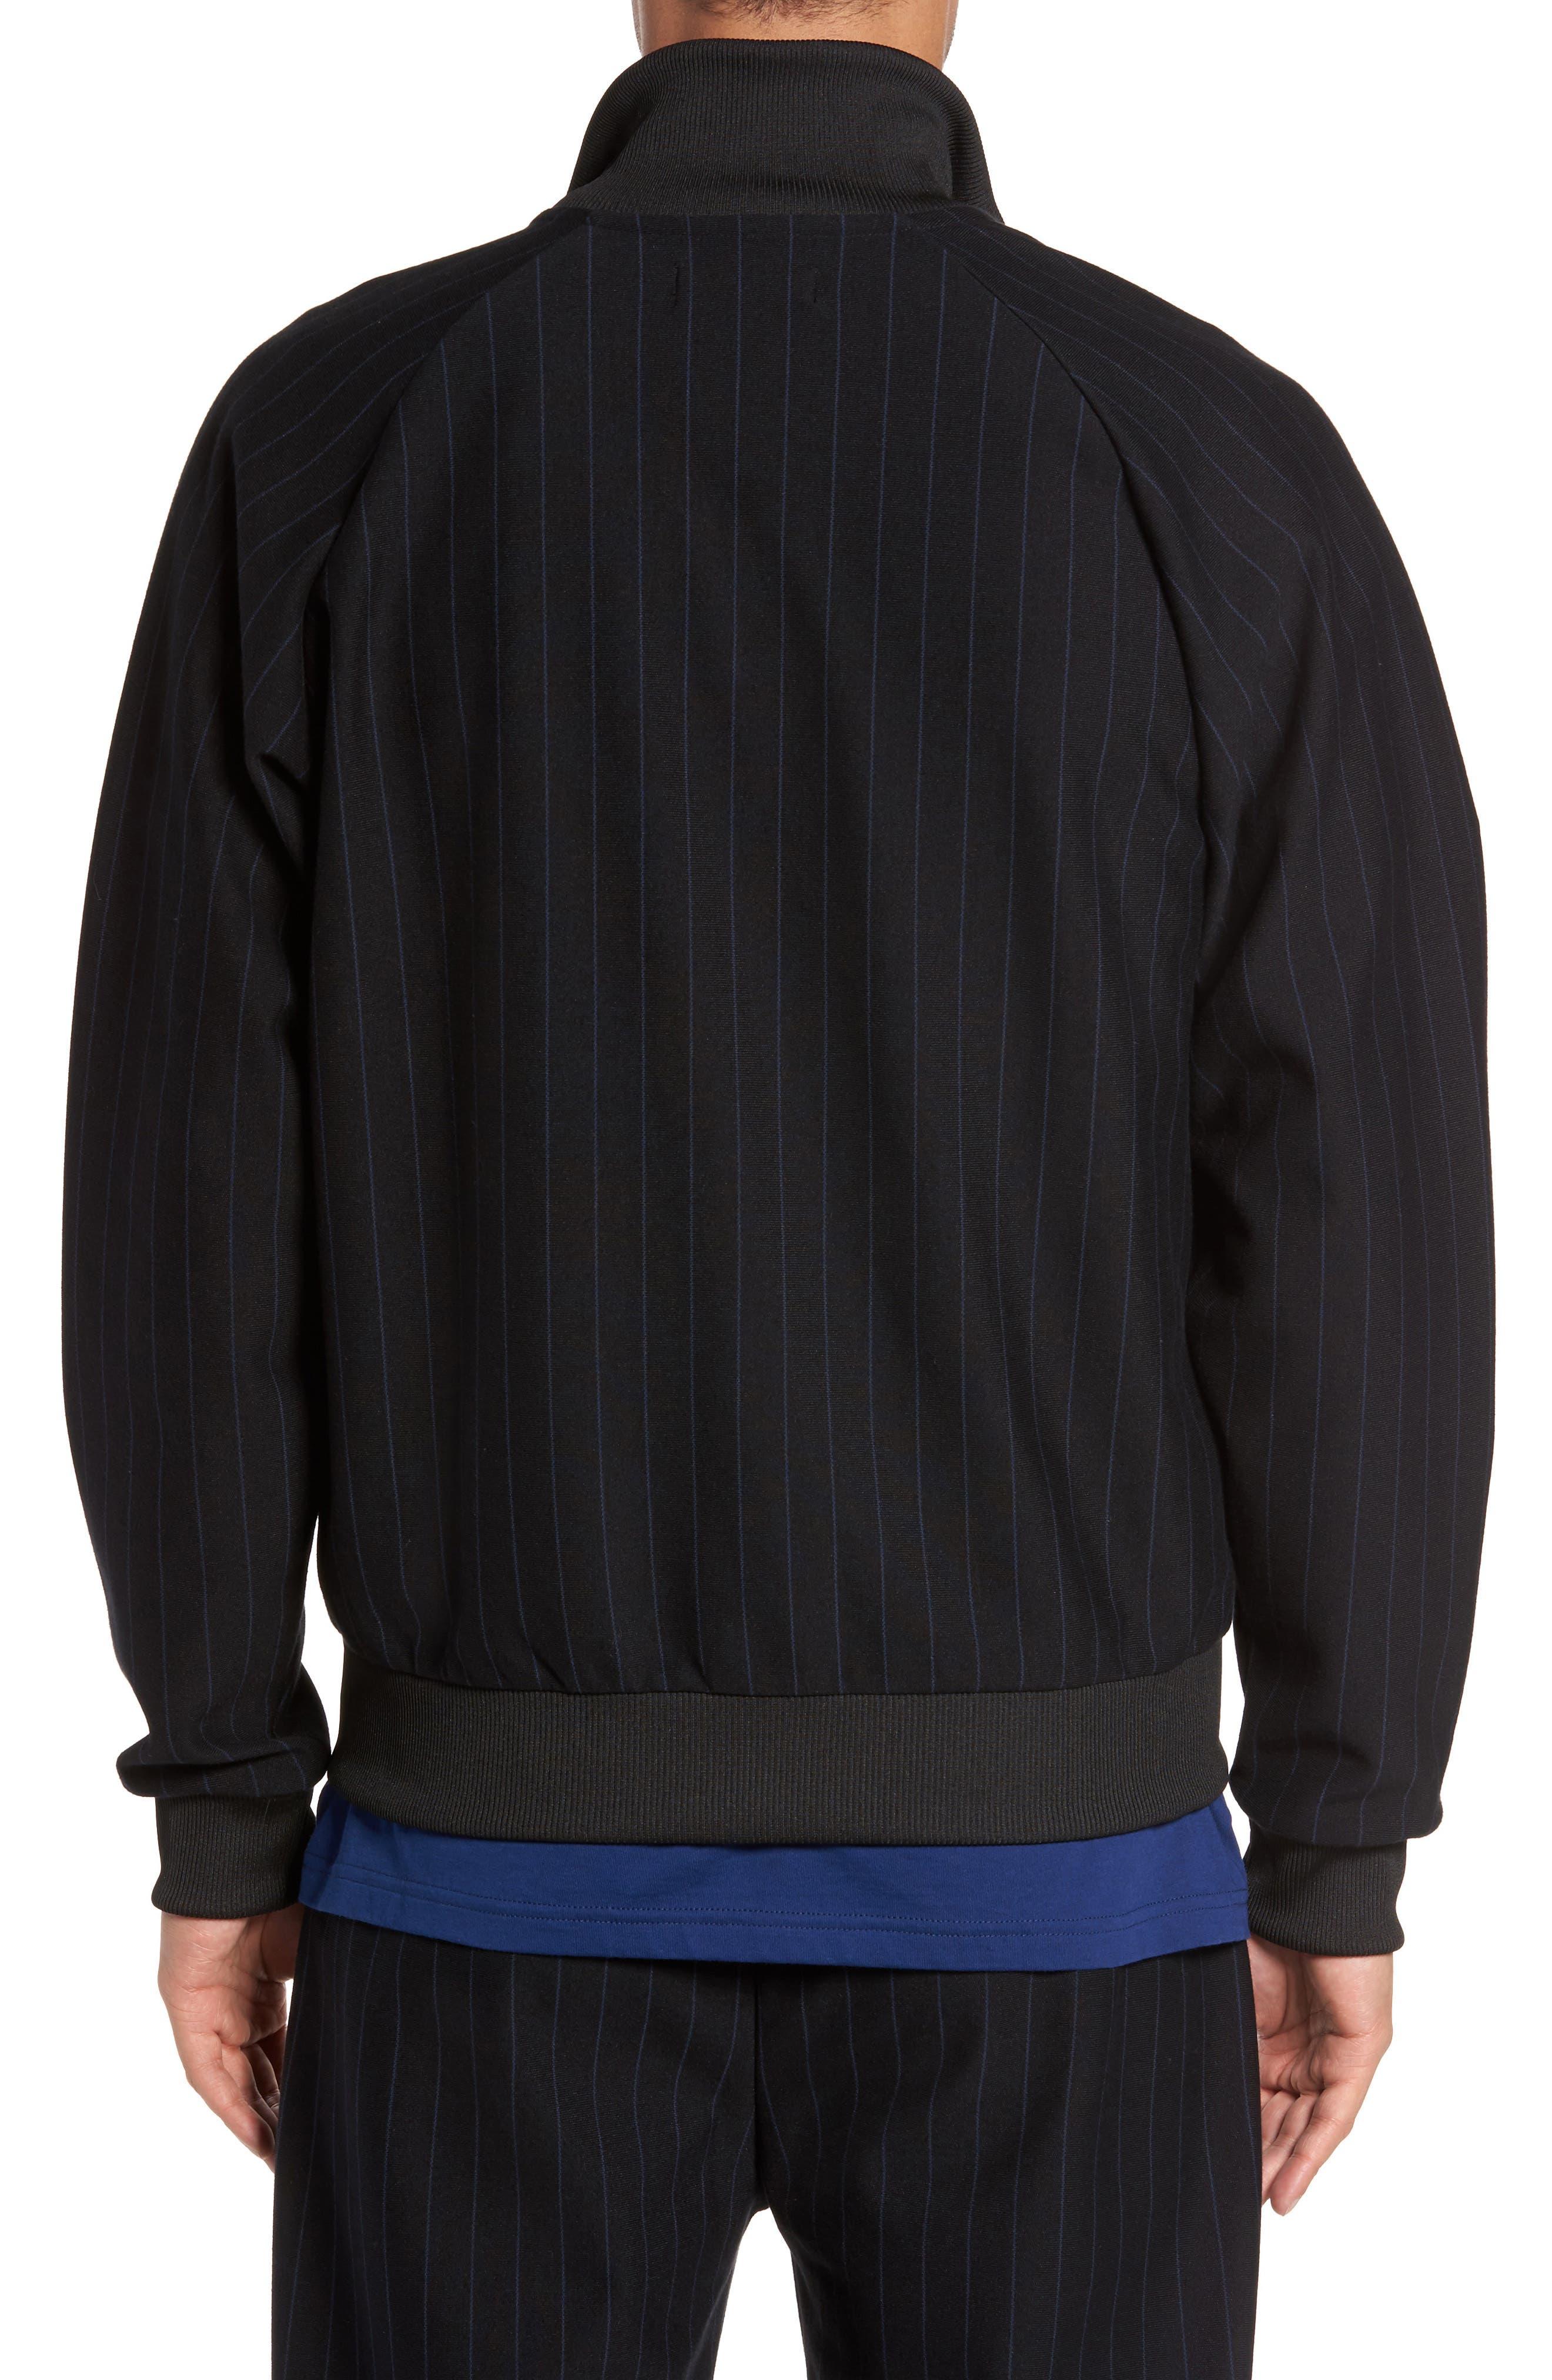 Pinstripe Track Jacket,                             Alternate thumbnail 2, color,                             Black